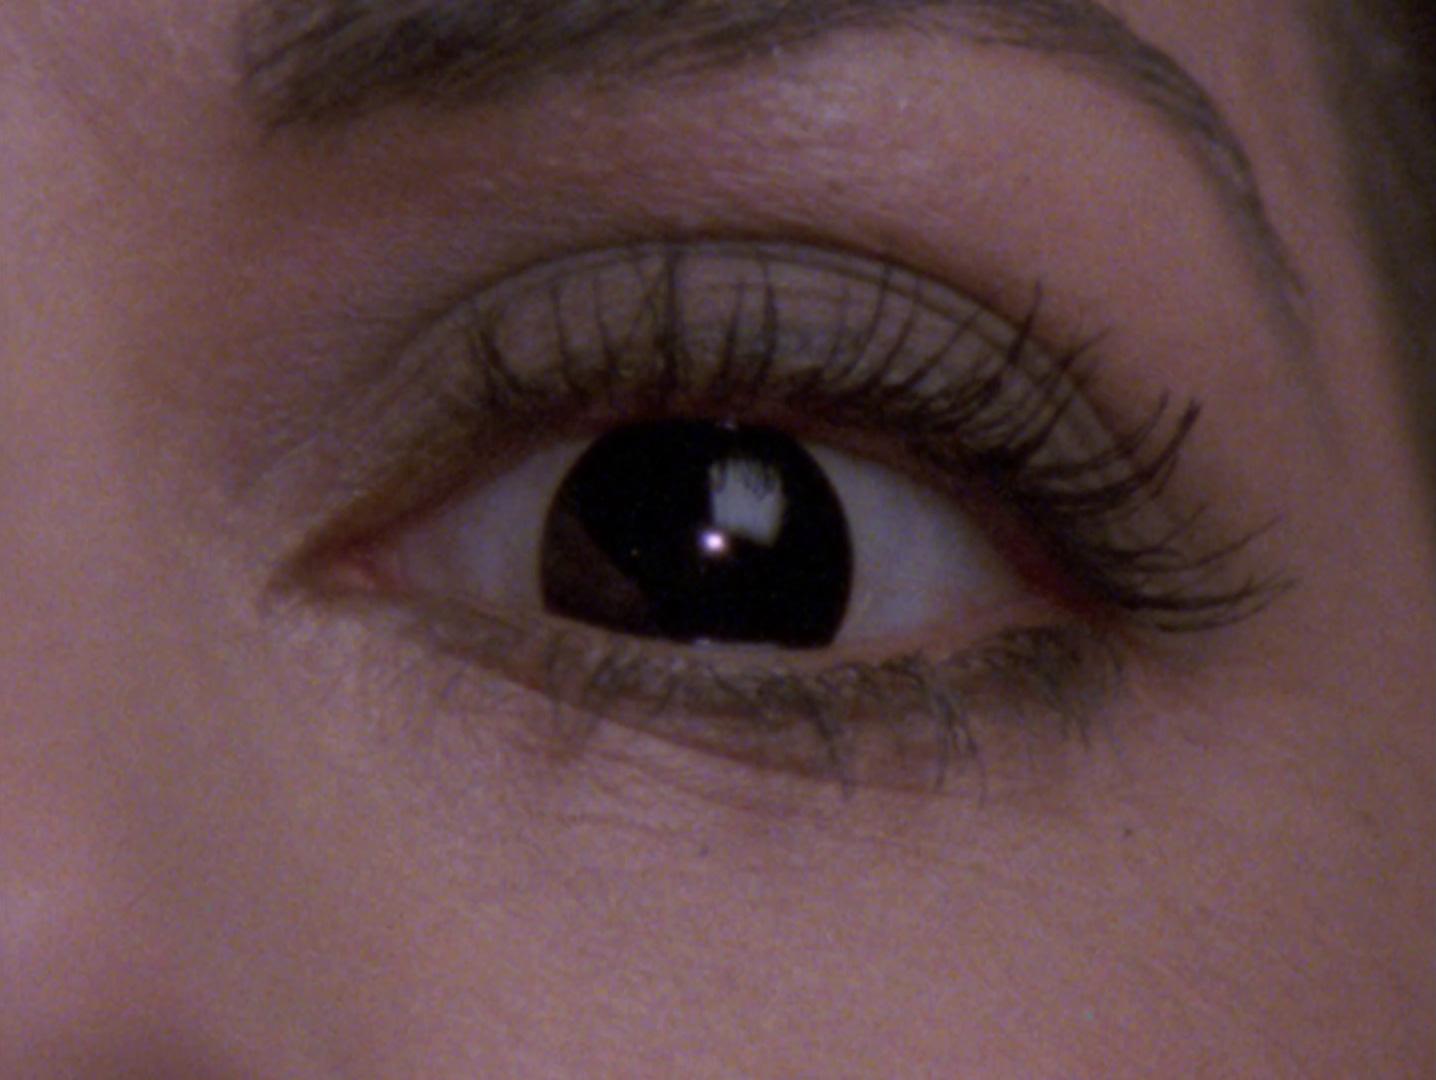 Betazoid Auge.jpg